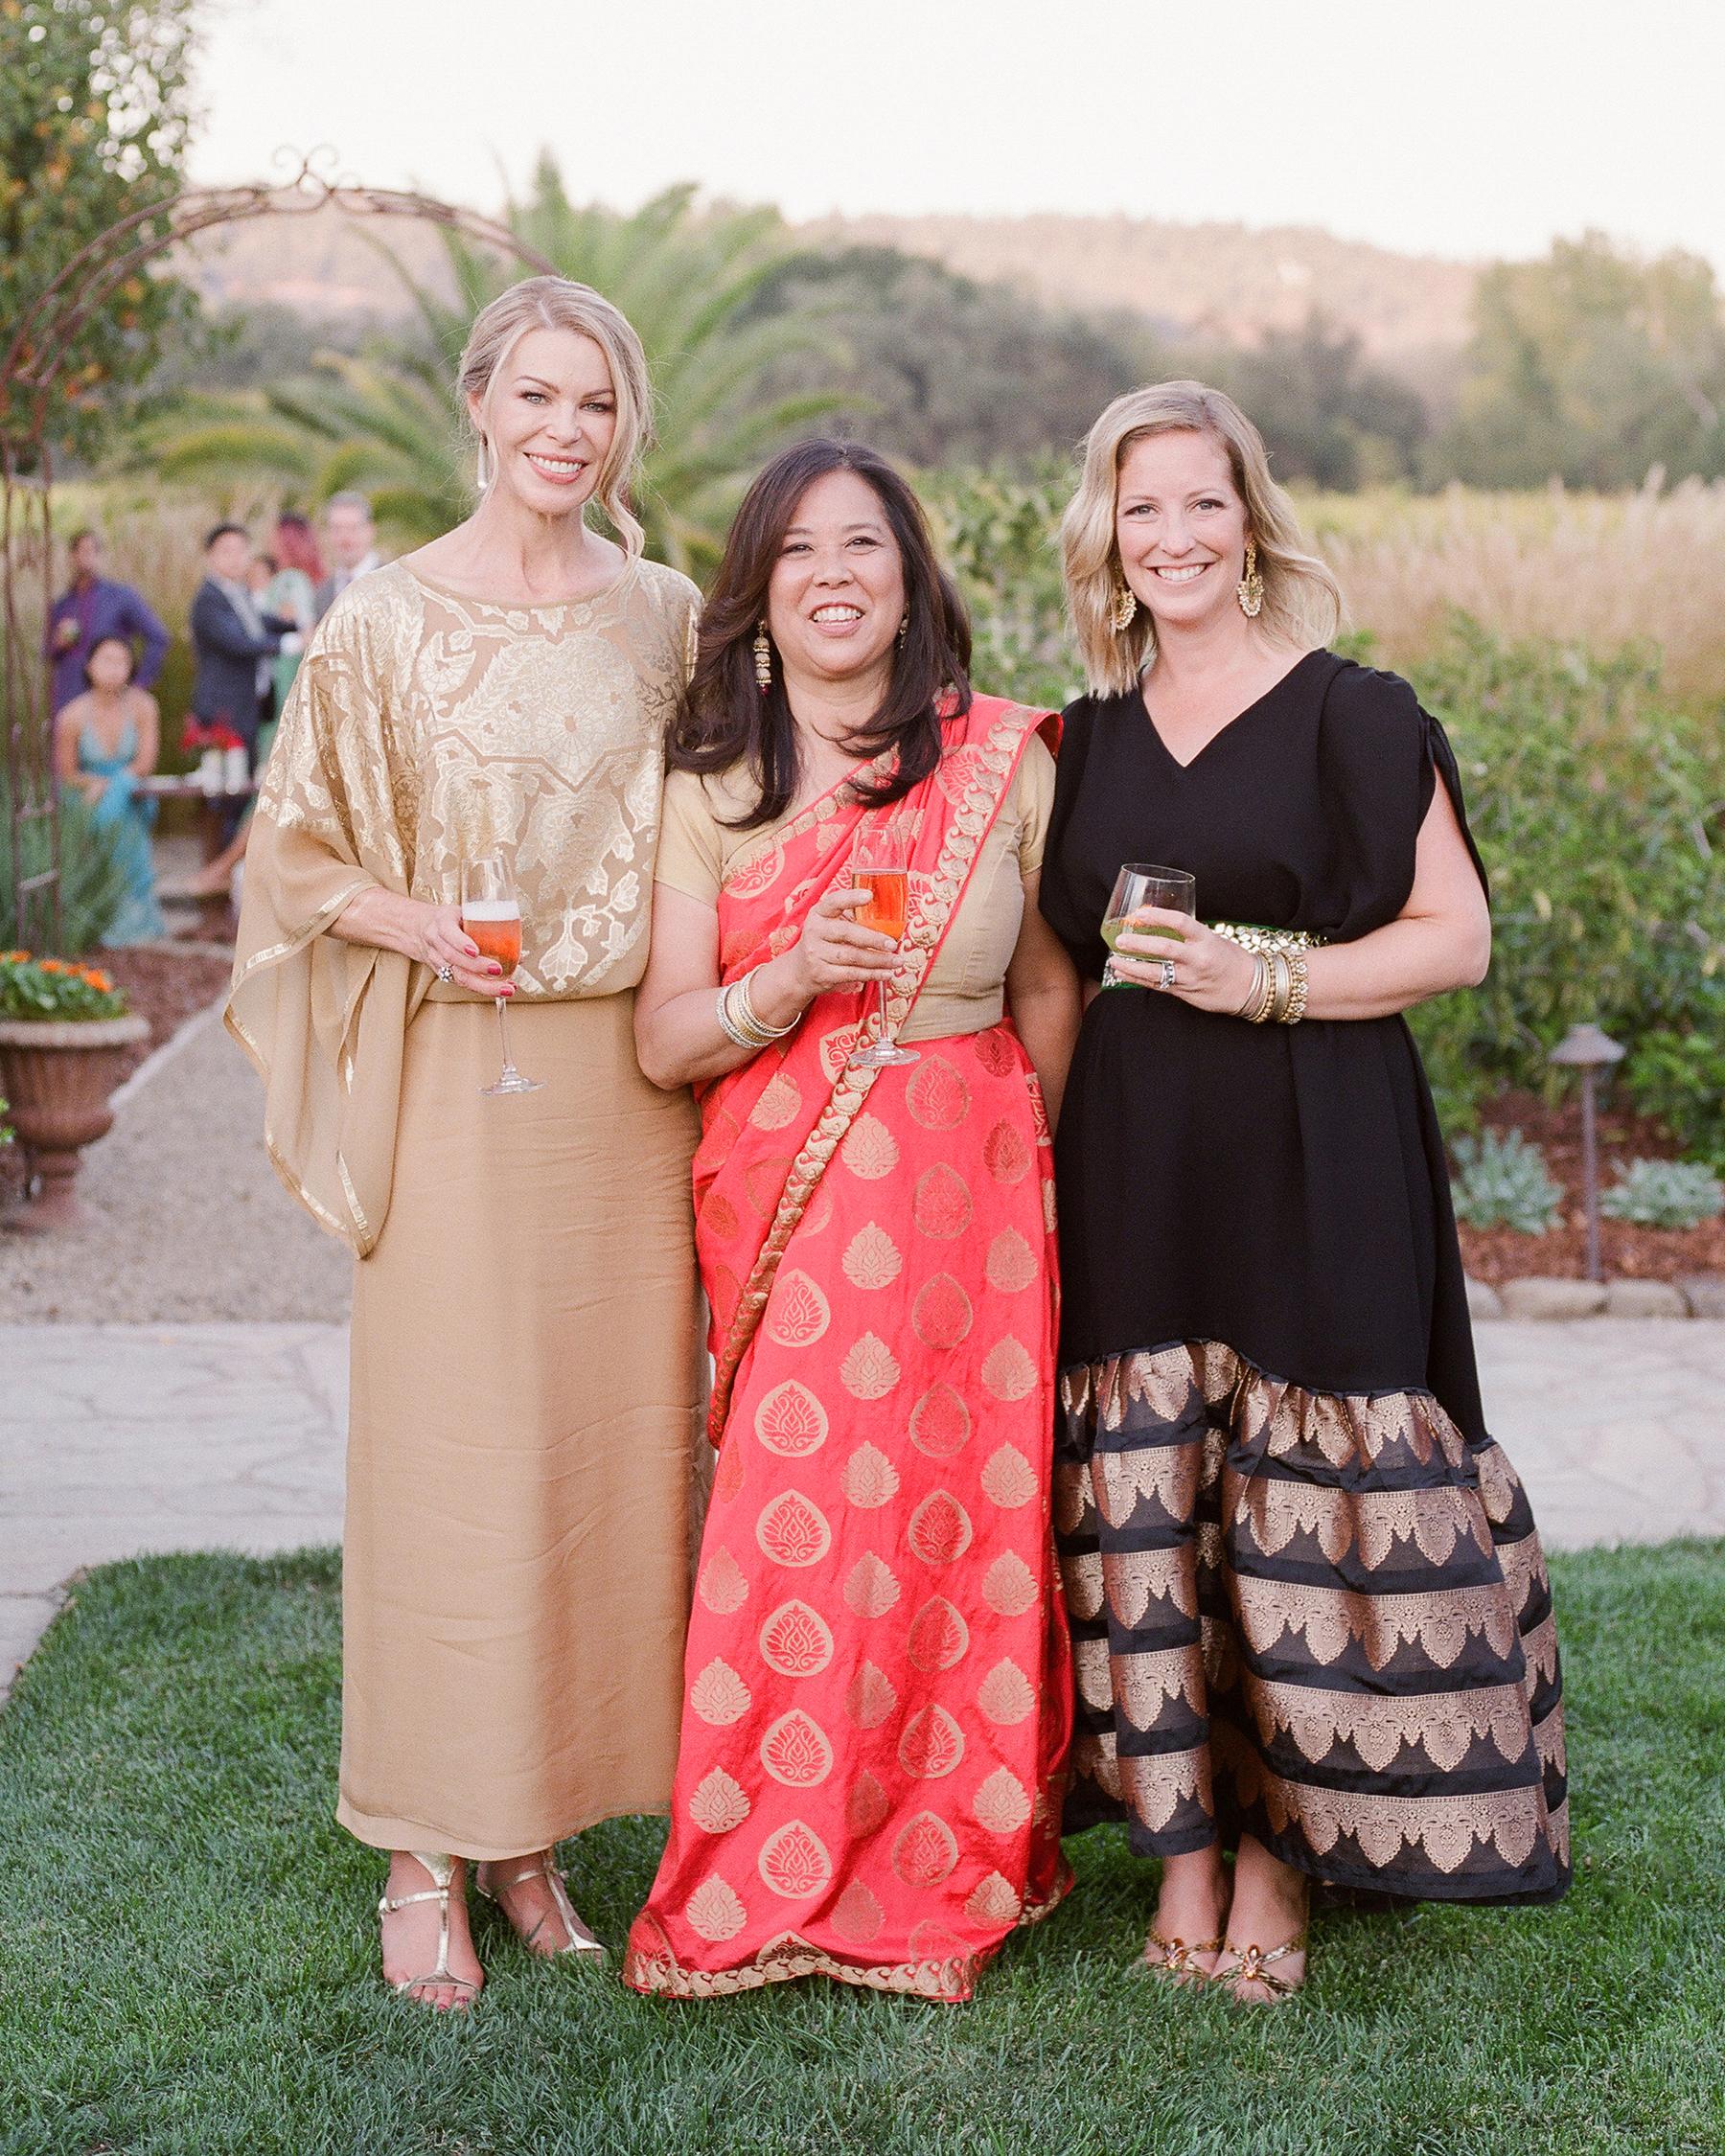 jenna alok wedding wine country california guests